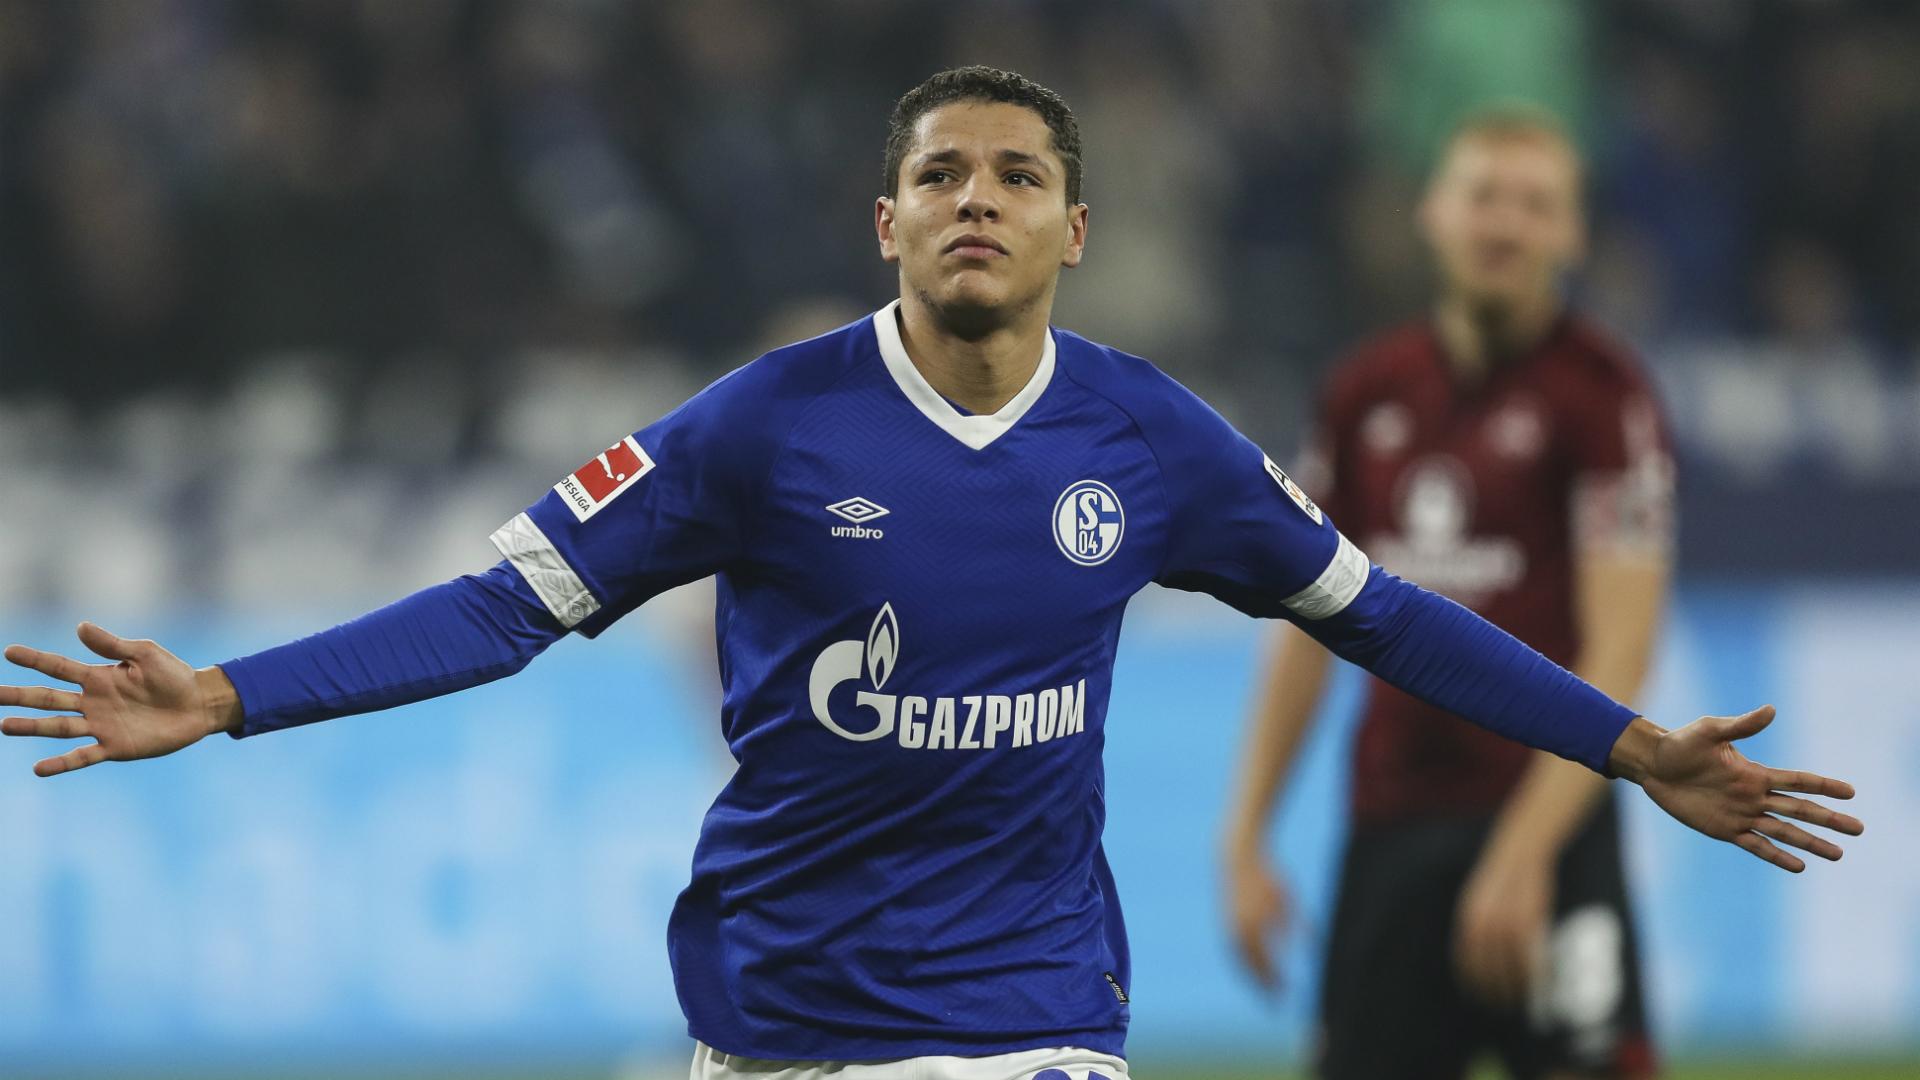 Schalke 04's Harit named Bundesliga Player of the Month